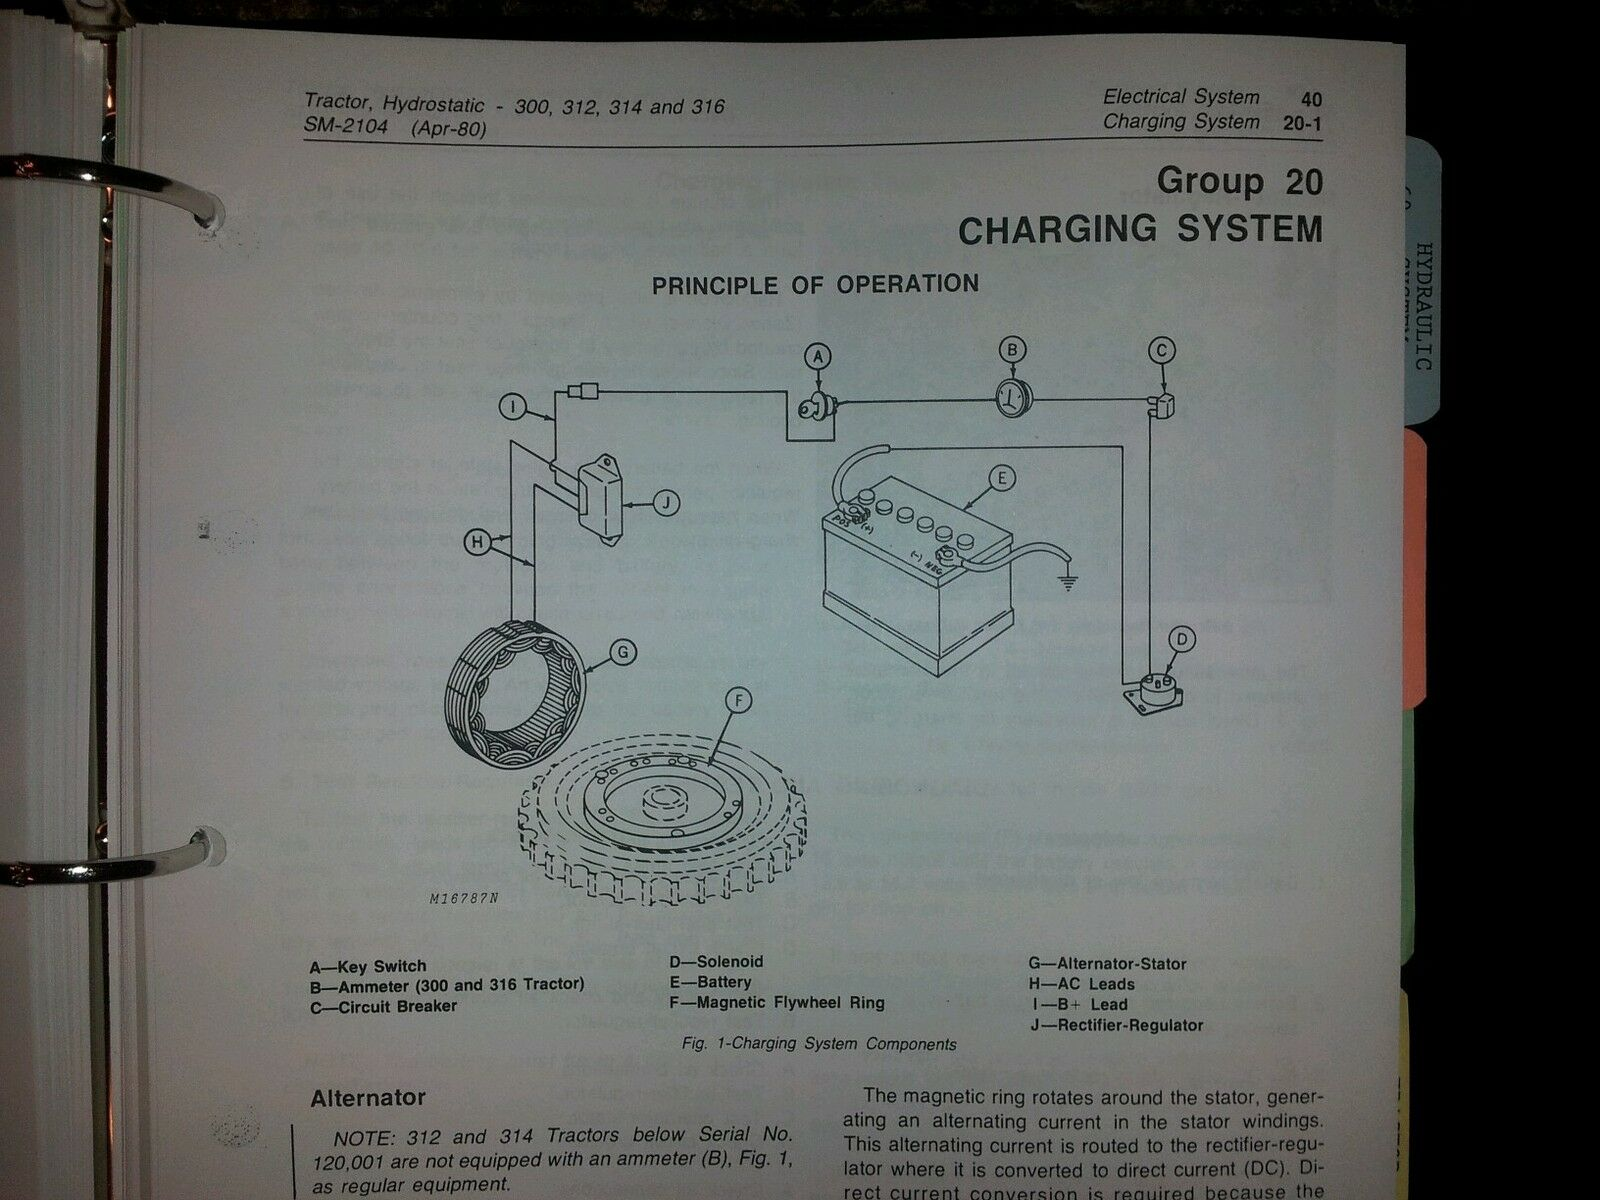 Marvelous Case 580 Wiring Schematics John Deere 110 Wiring Schematics Wiring 101 Capemaxxcnl